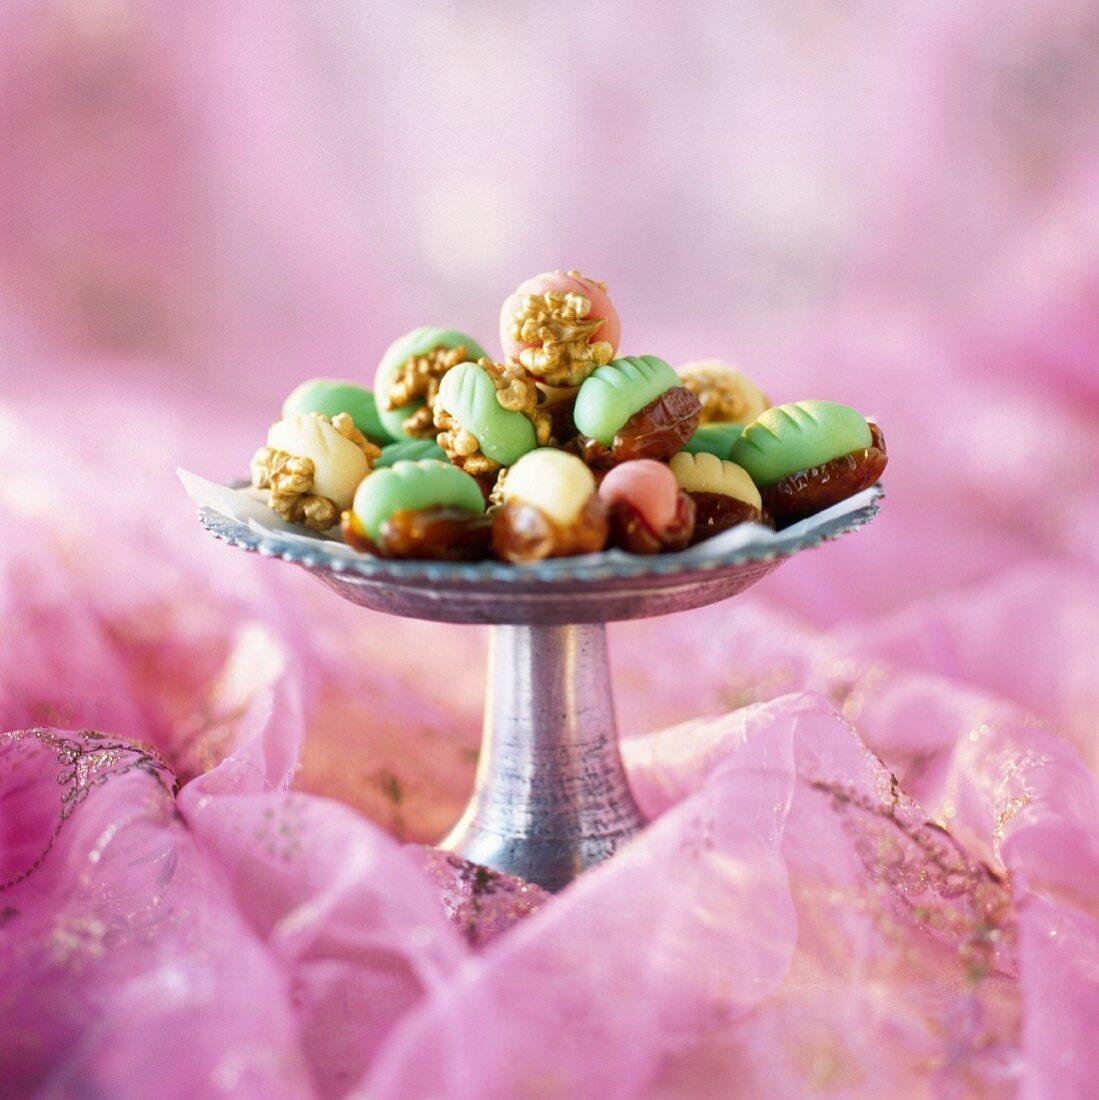 Marzipan-stuffed dates and walnuts